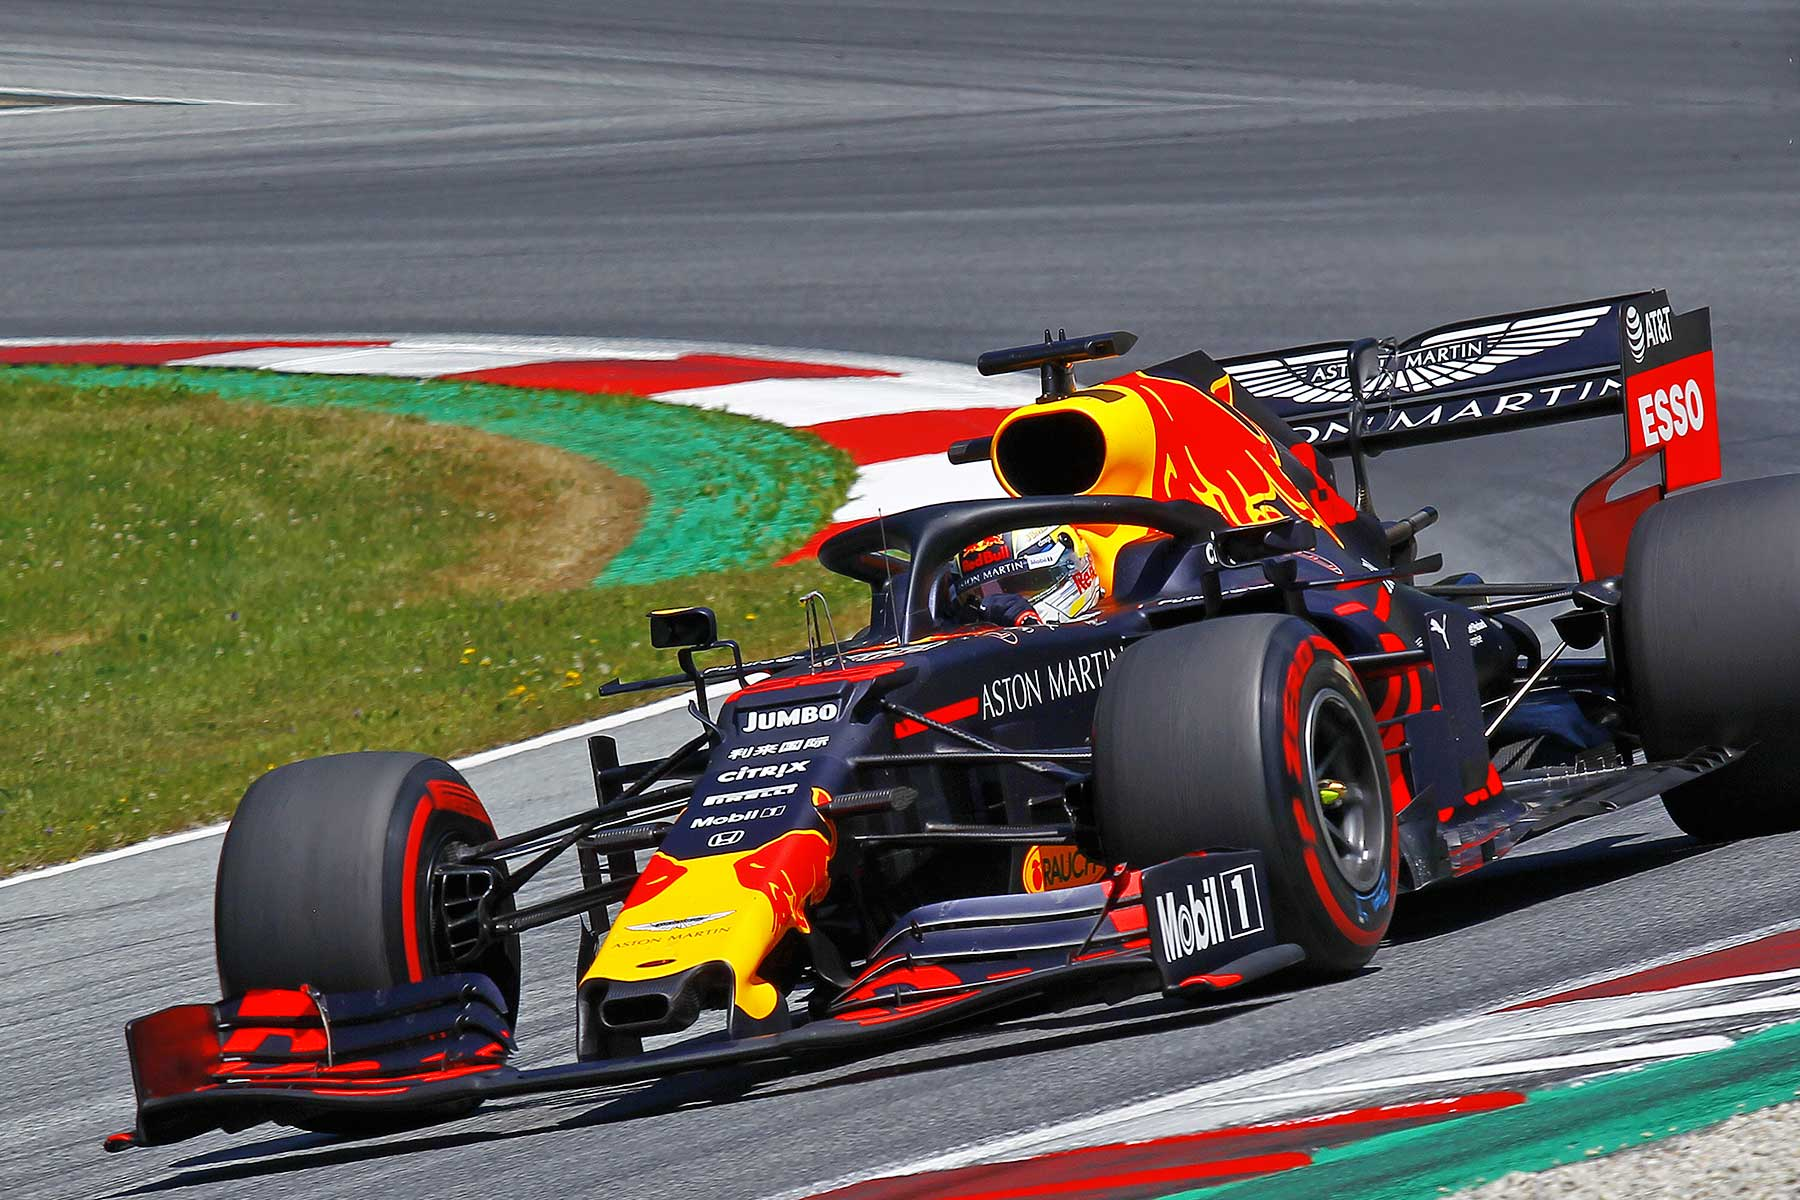 Østrigs Grand Prix